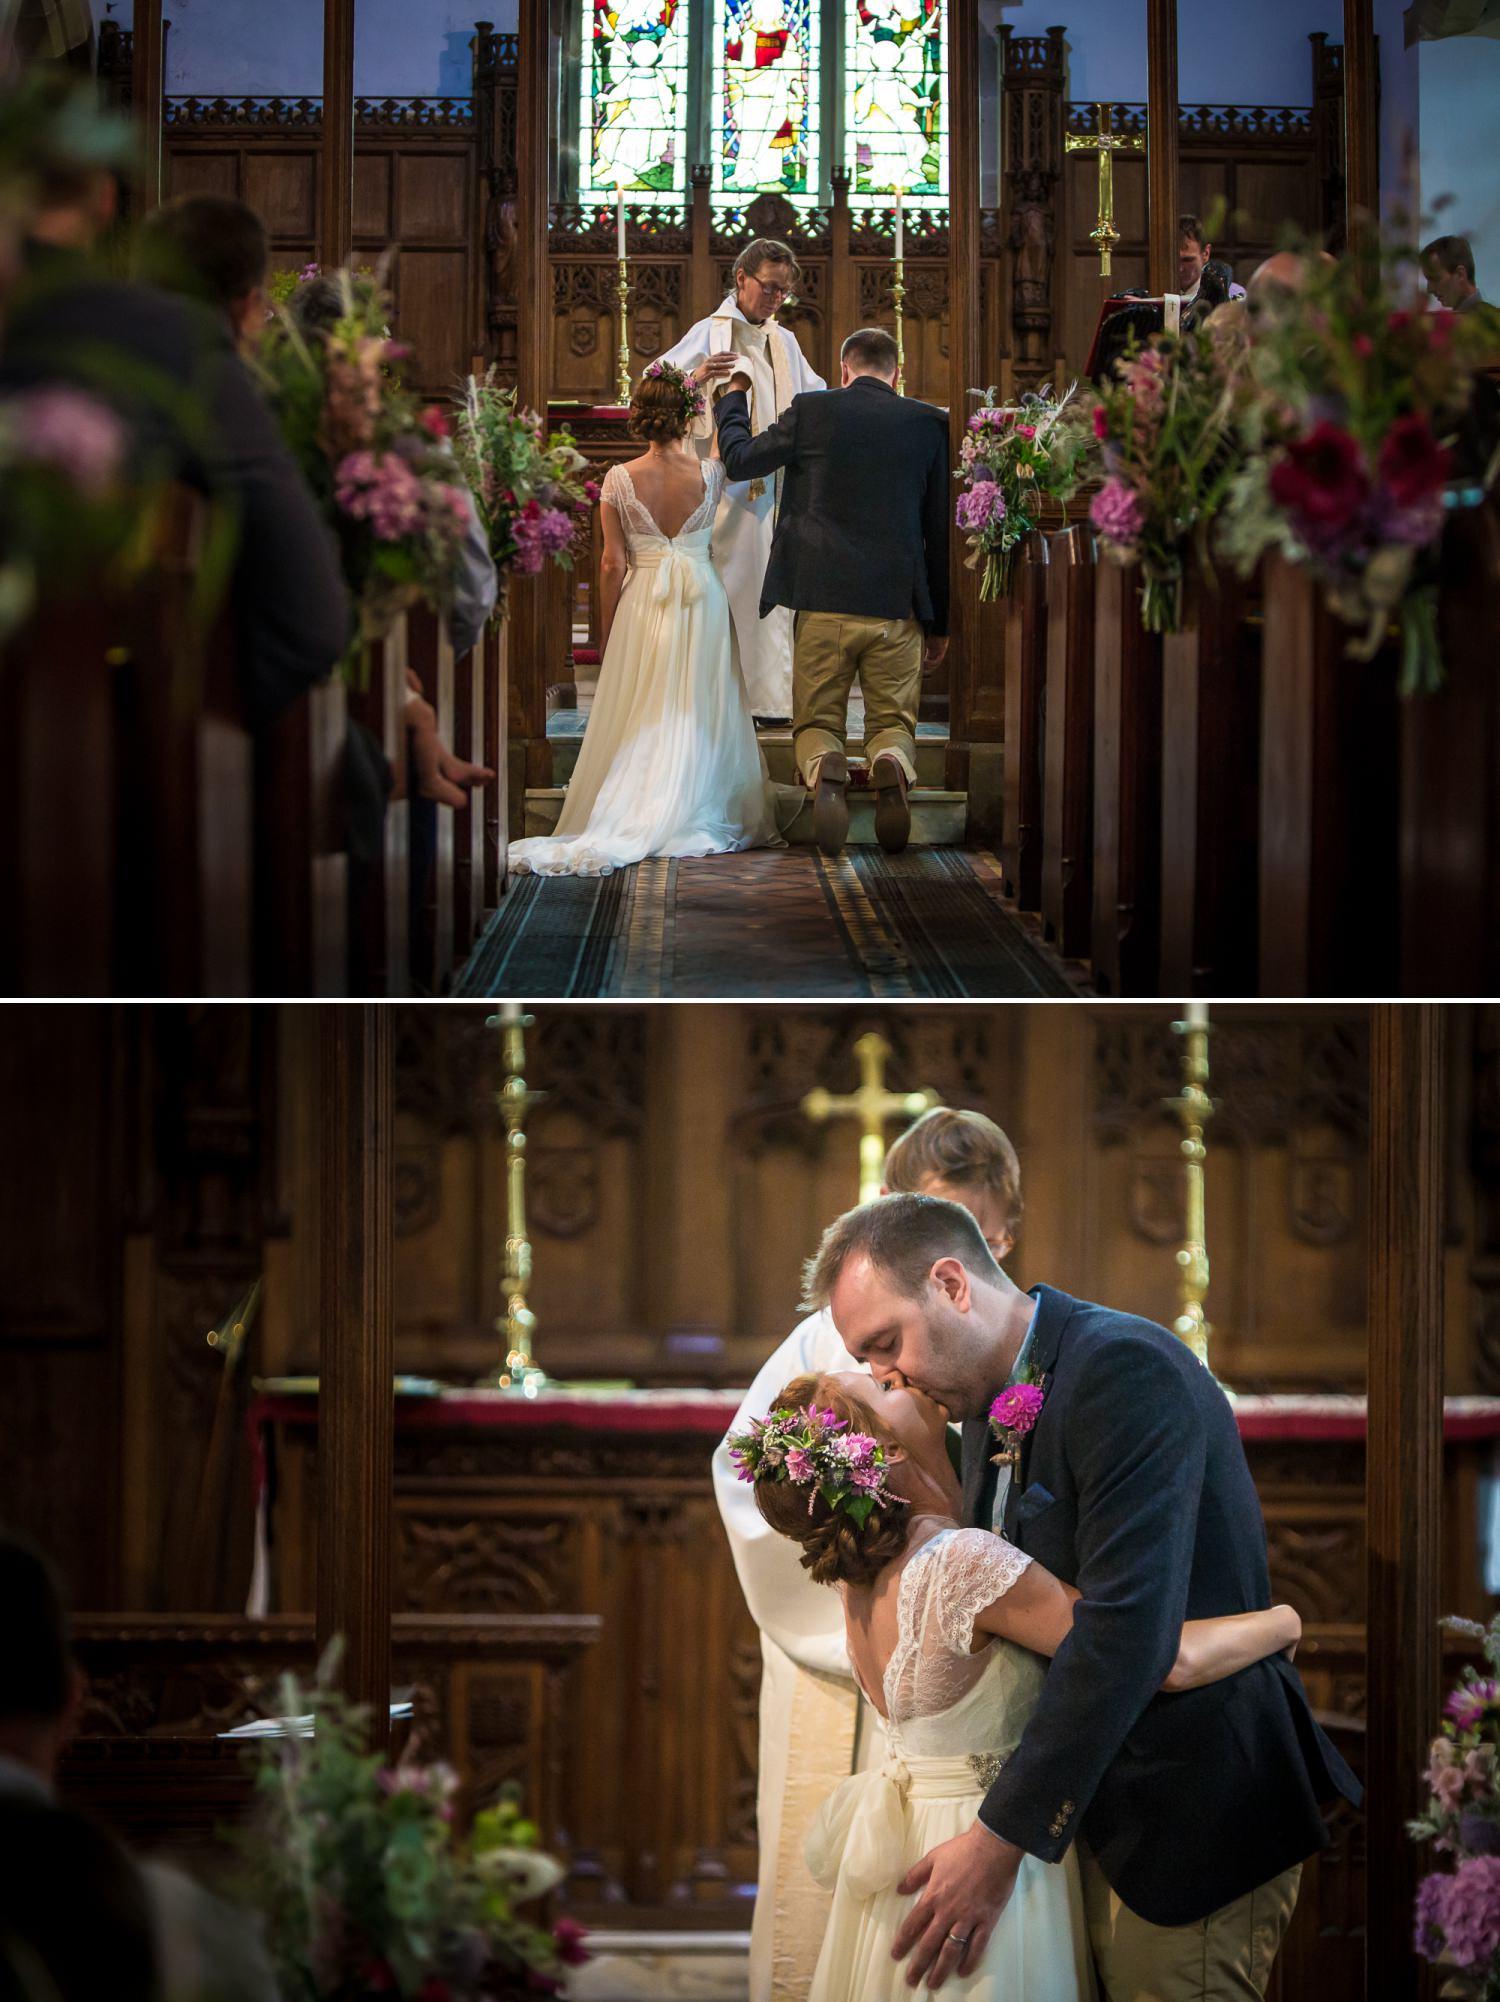 Wedding photographer Plas Isaf church ceremony